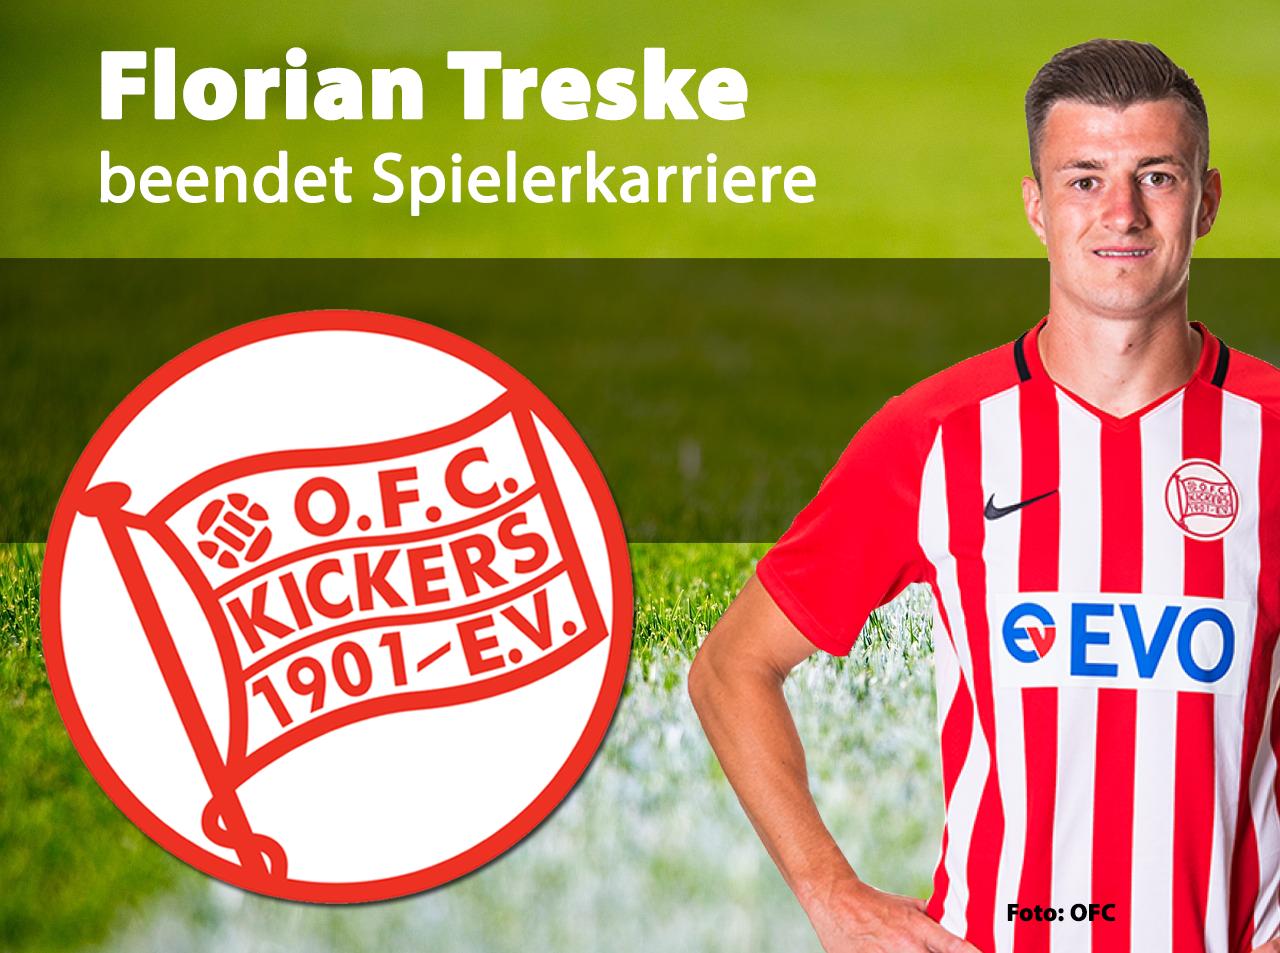 Florian Treske